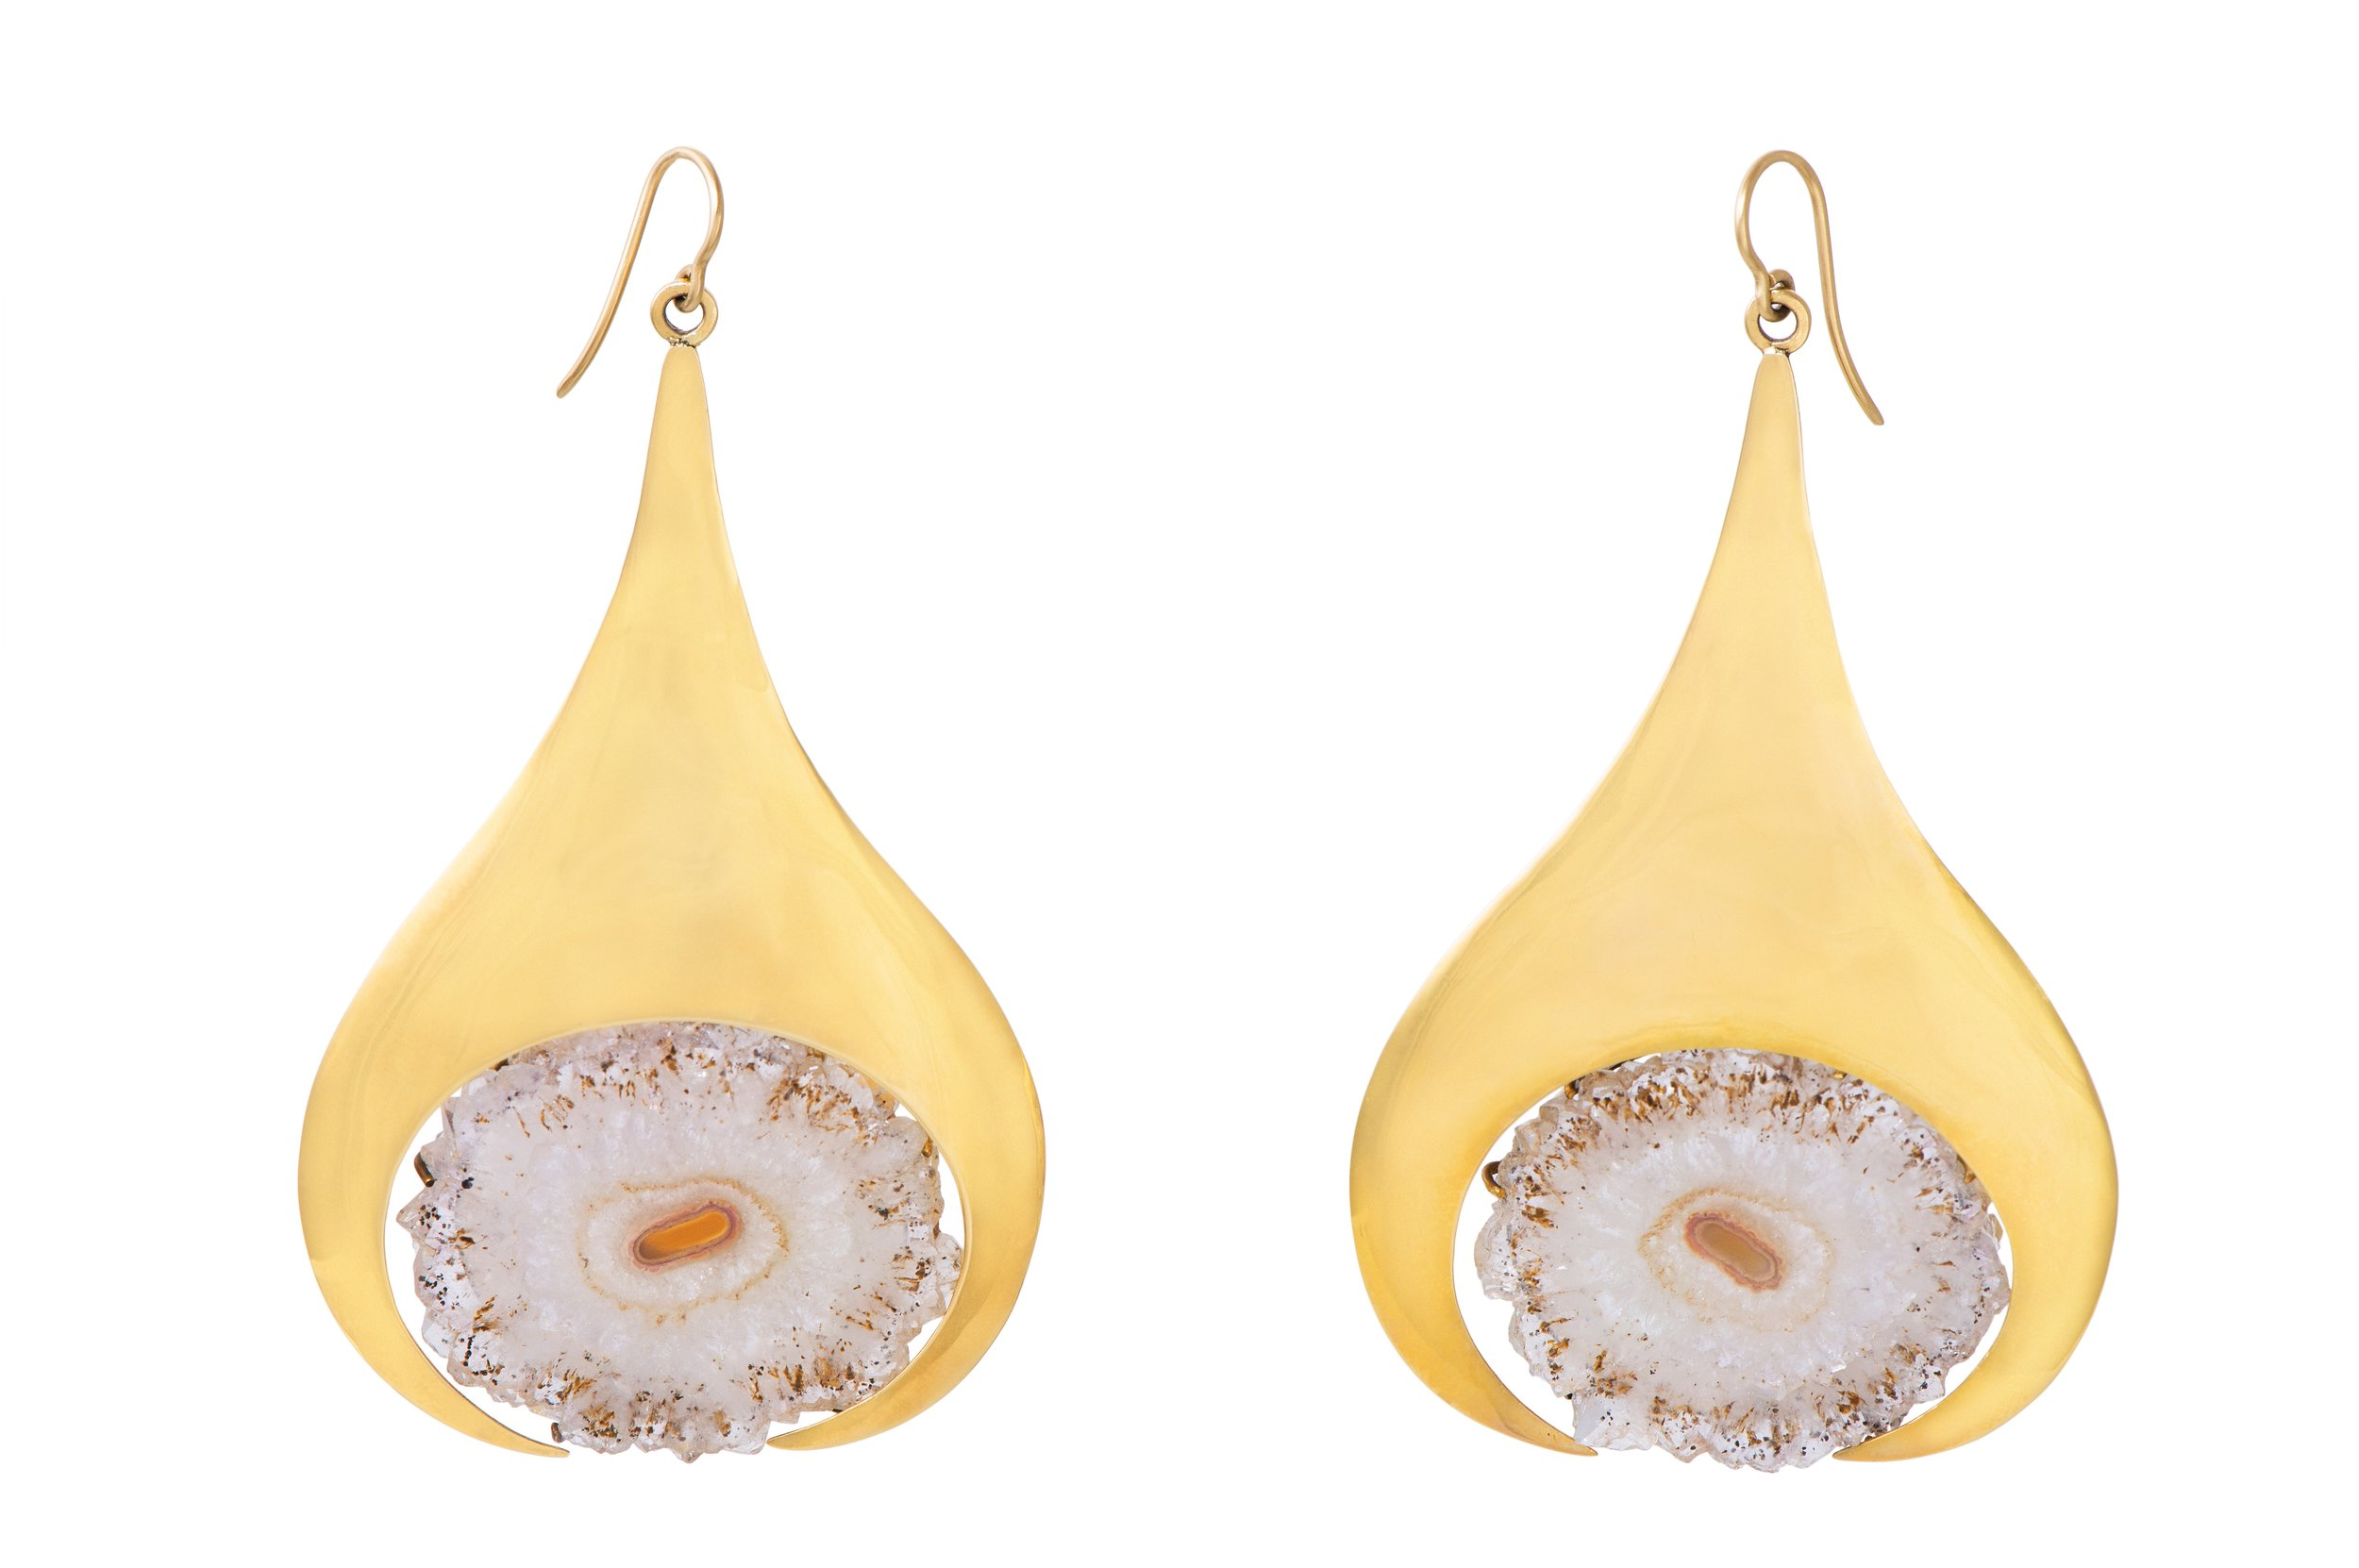 Pair of amethyst slice and 18-carat gold earrings, by Barbara Cartlidge, 1970.